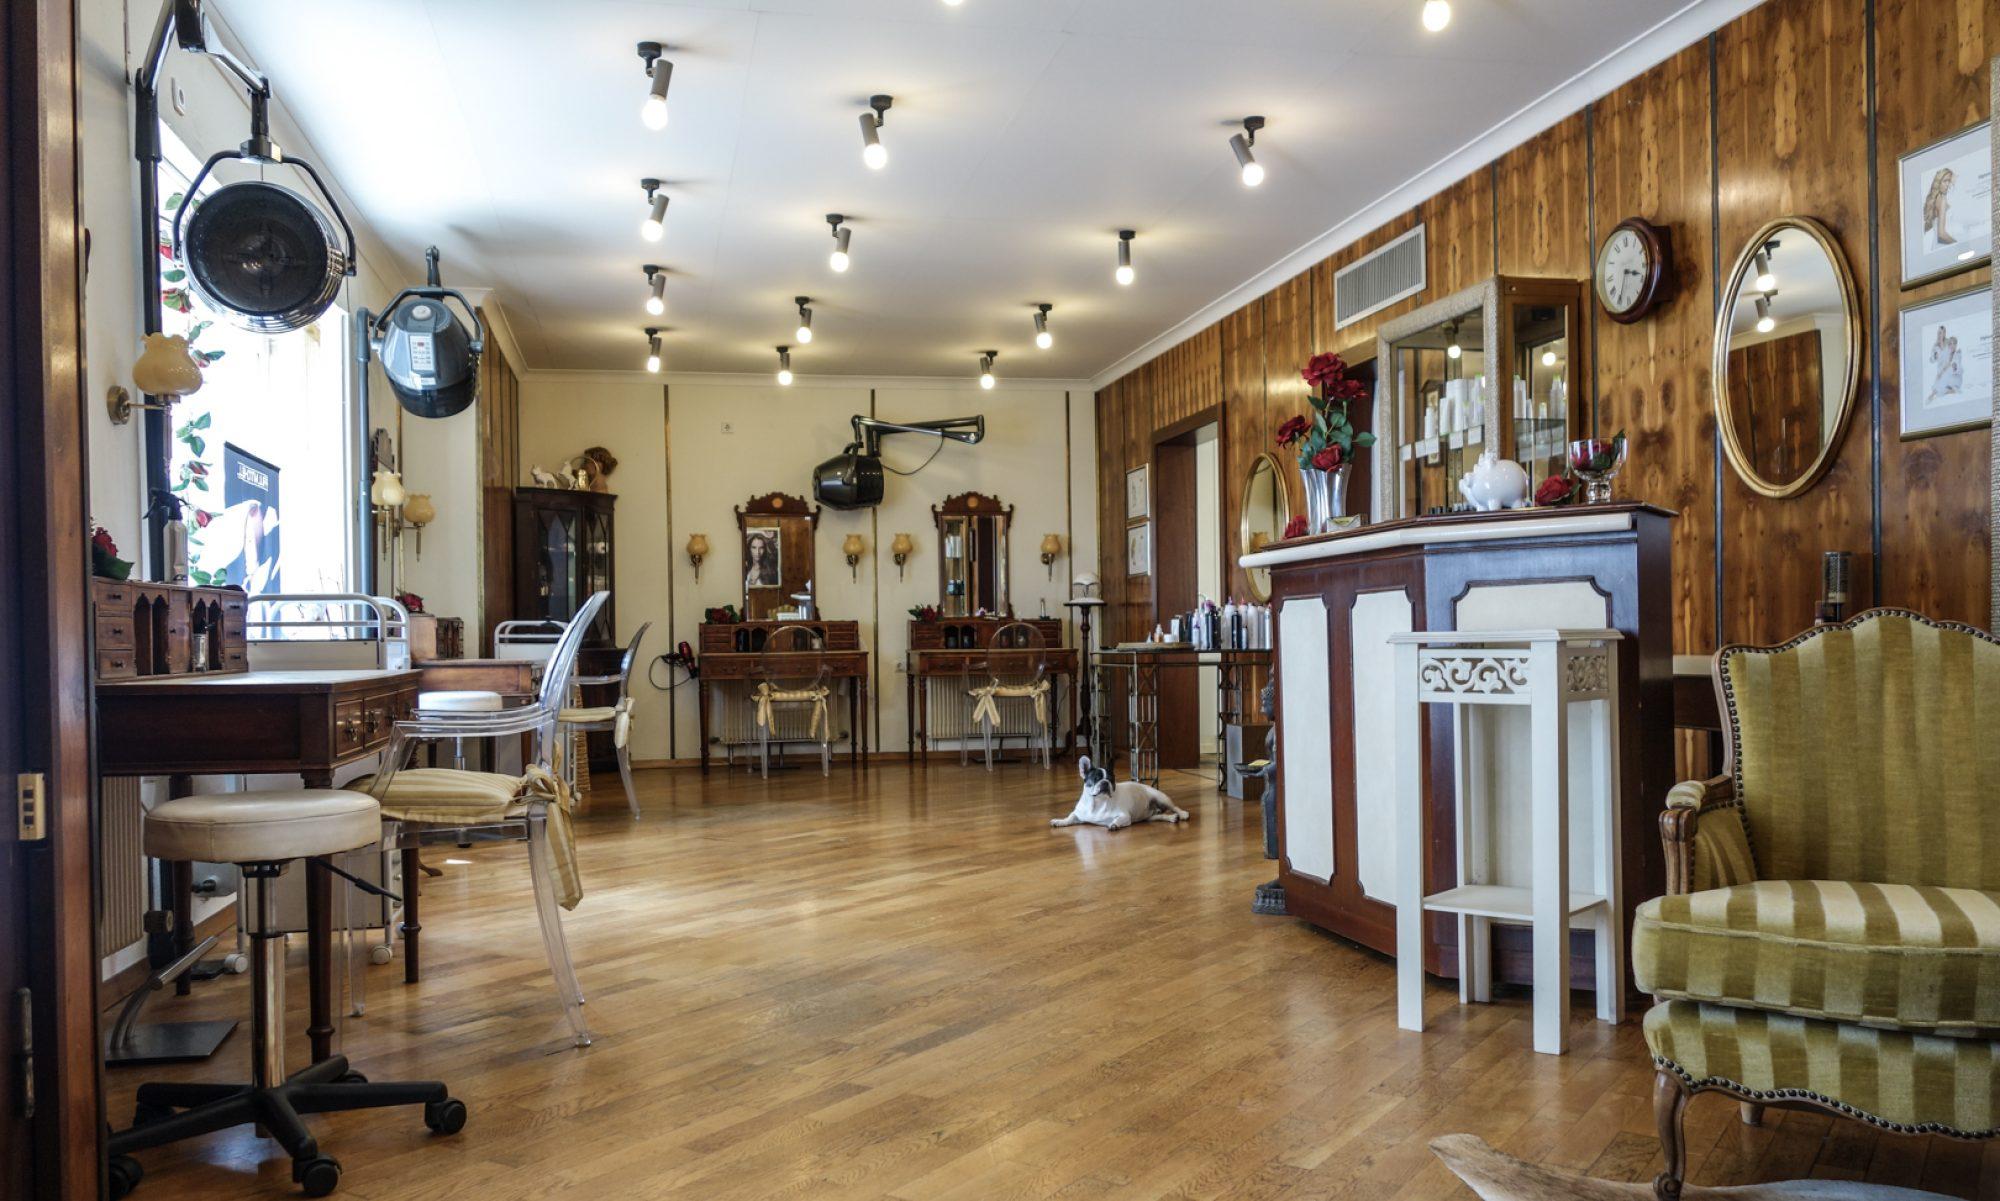 La Coiffure - Ihr Friseur in Stuttgart Botnang